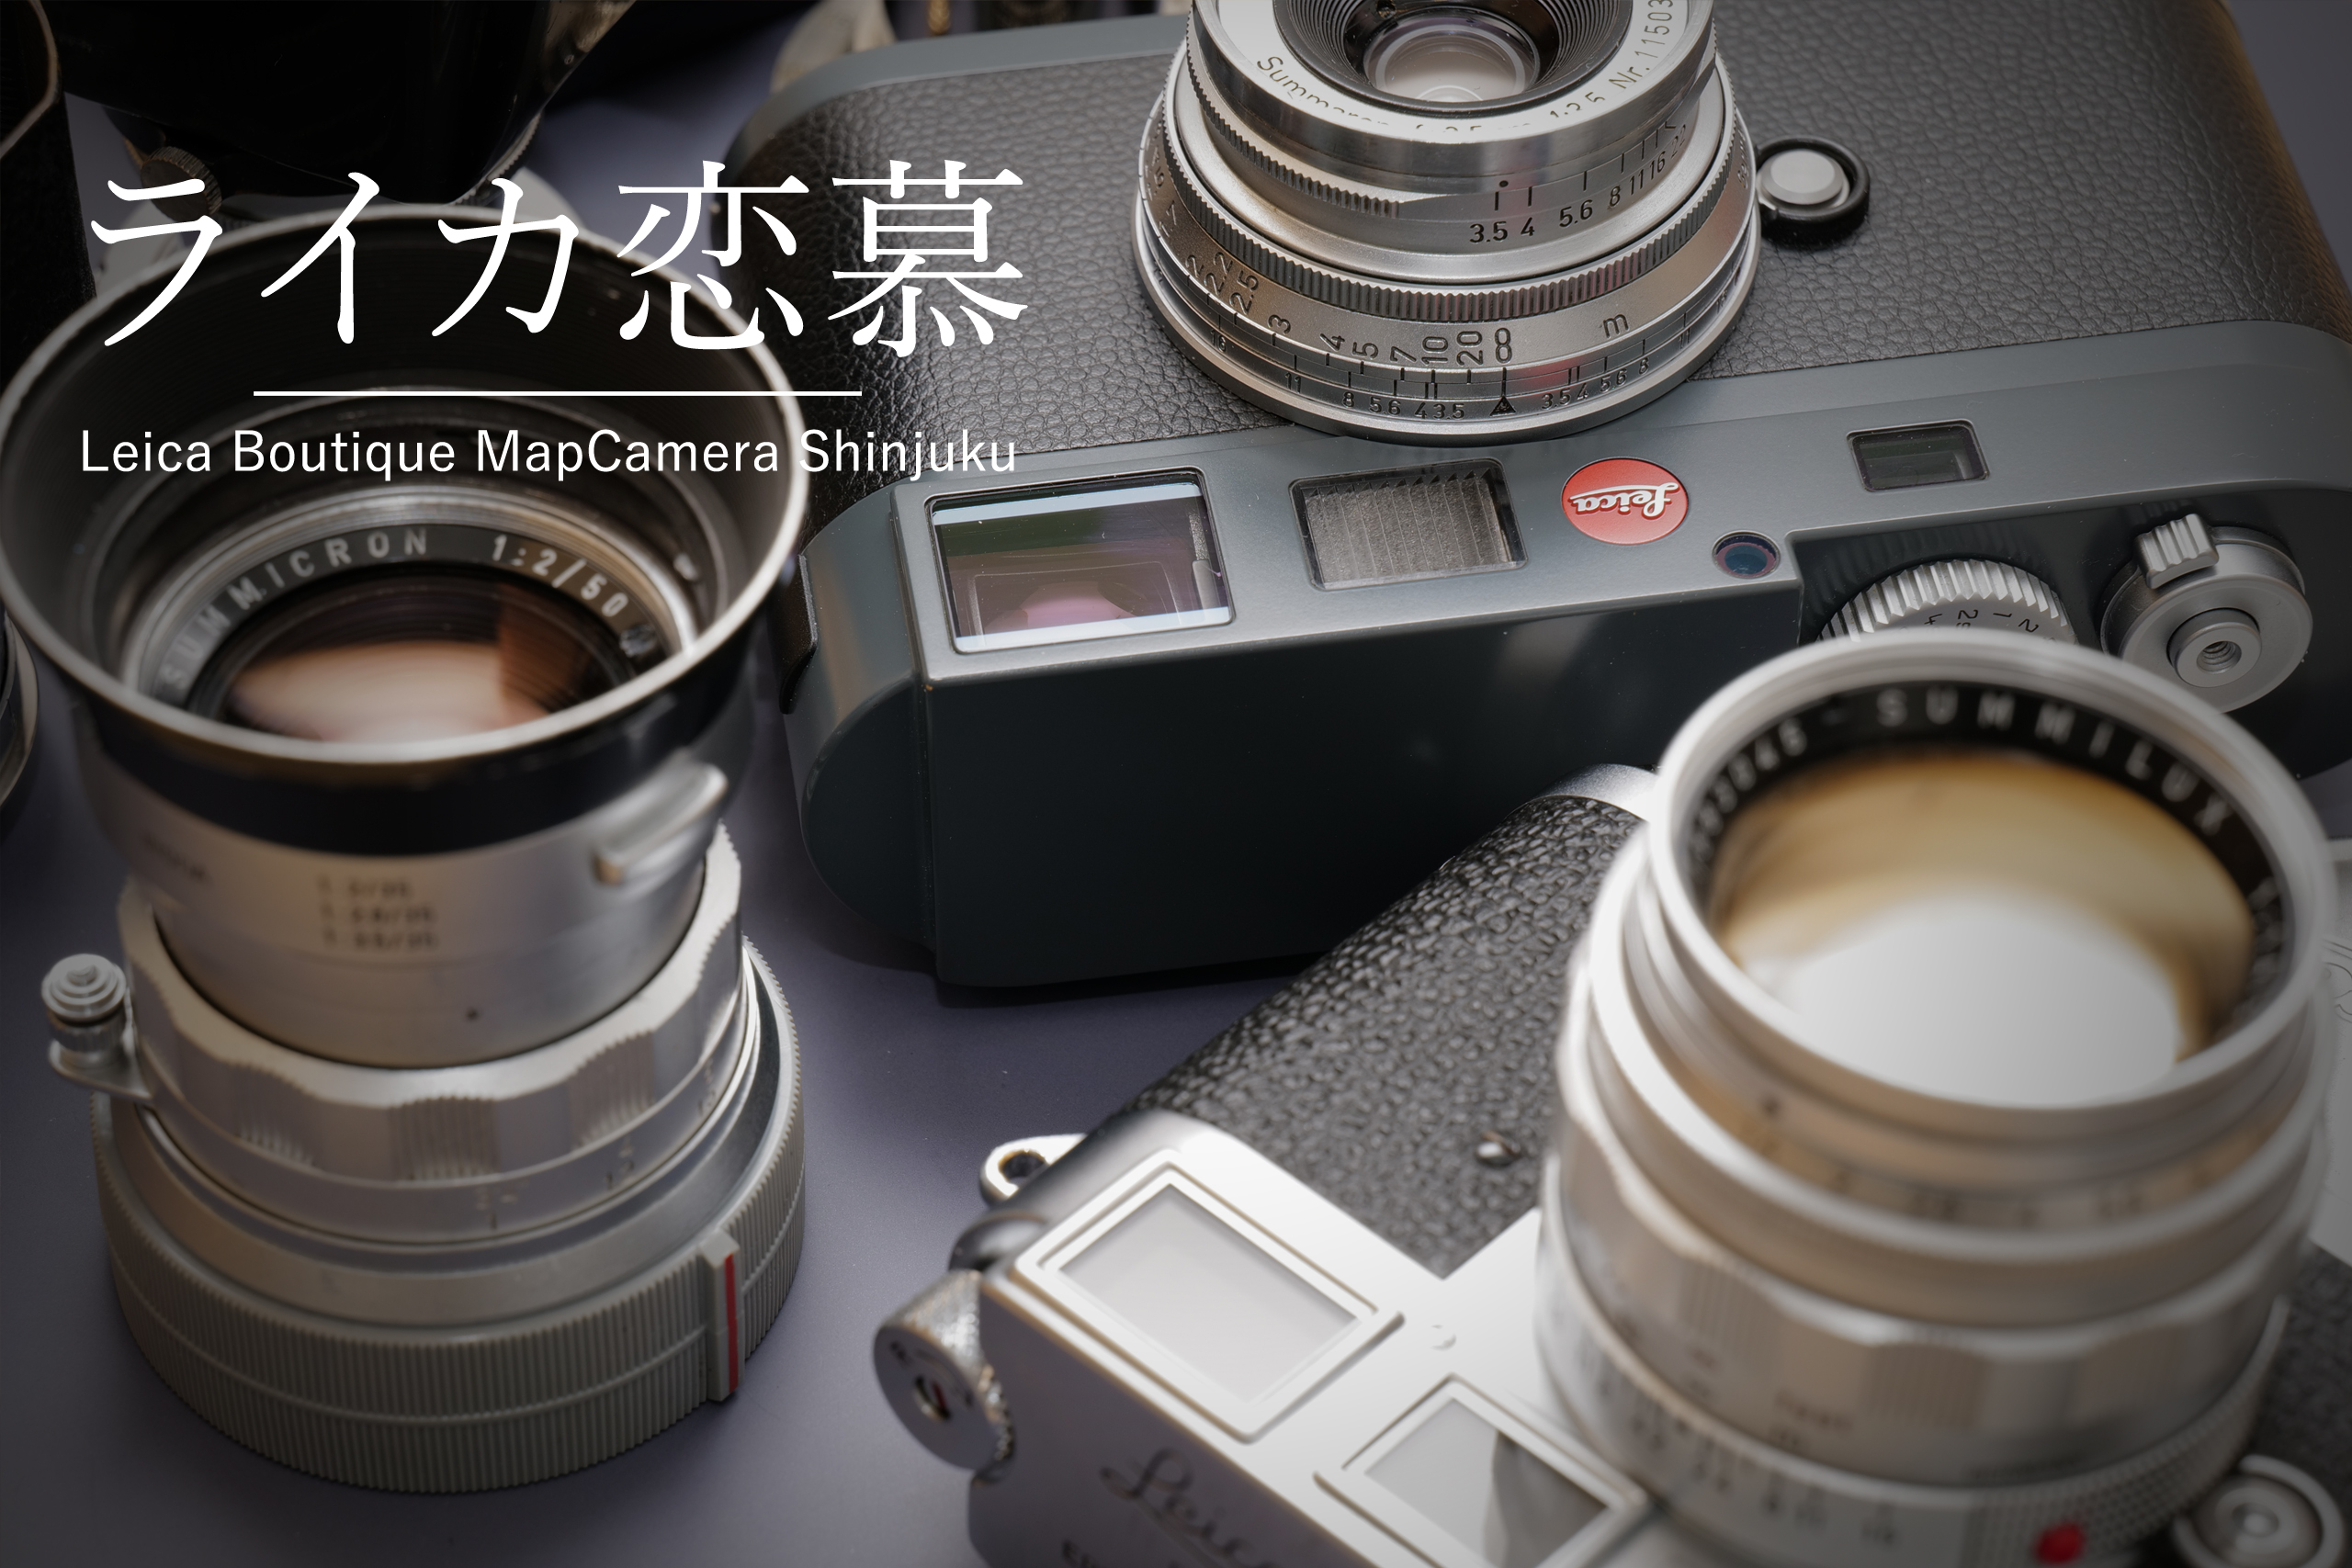 【Leica Boutique 8th】私のライカM3/M-E愛